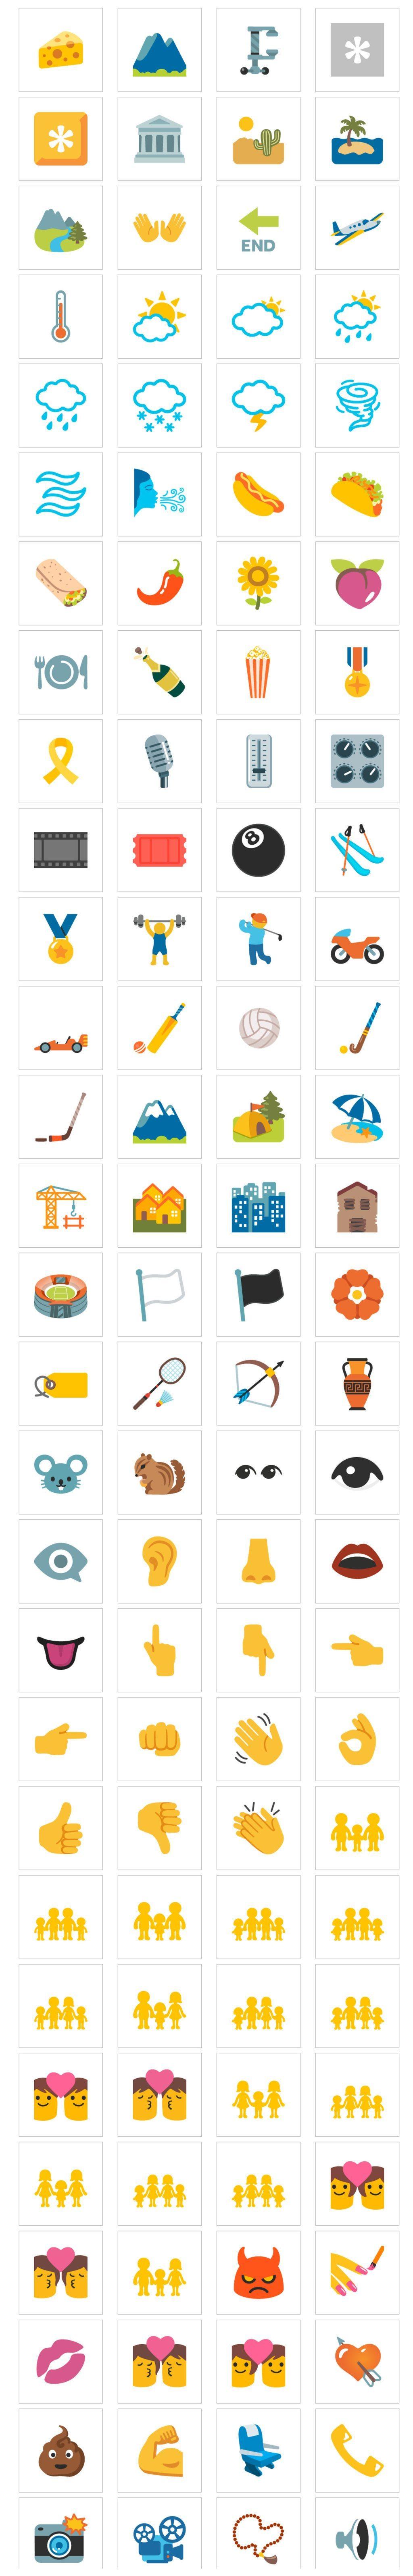 android-yeni-emojiler-081215